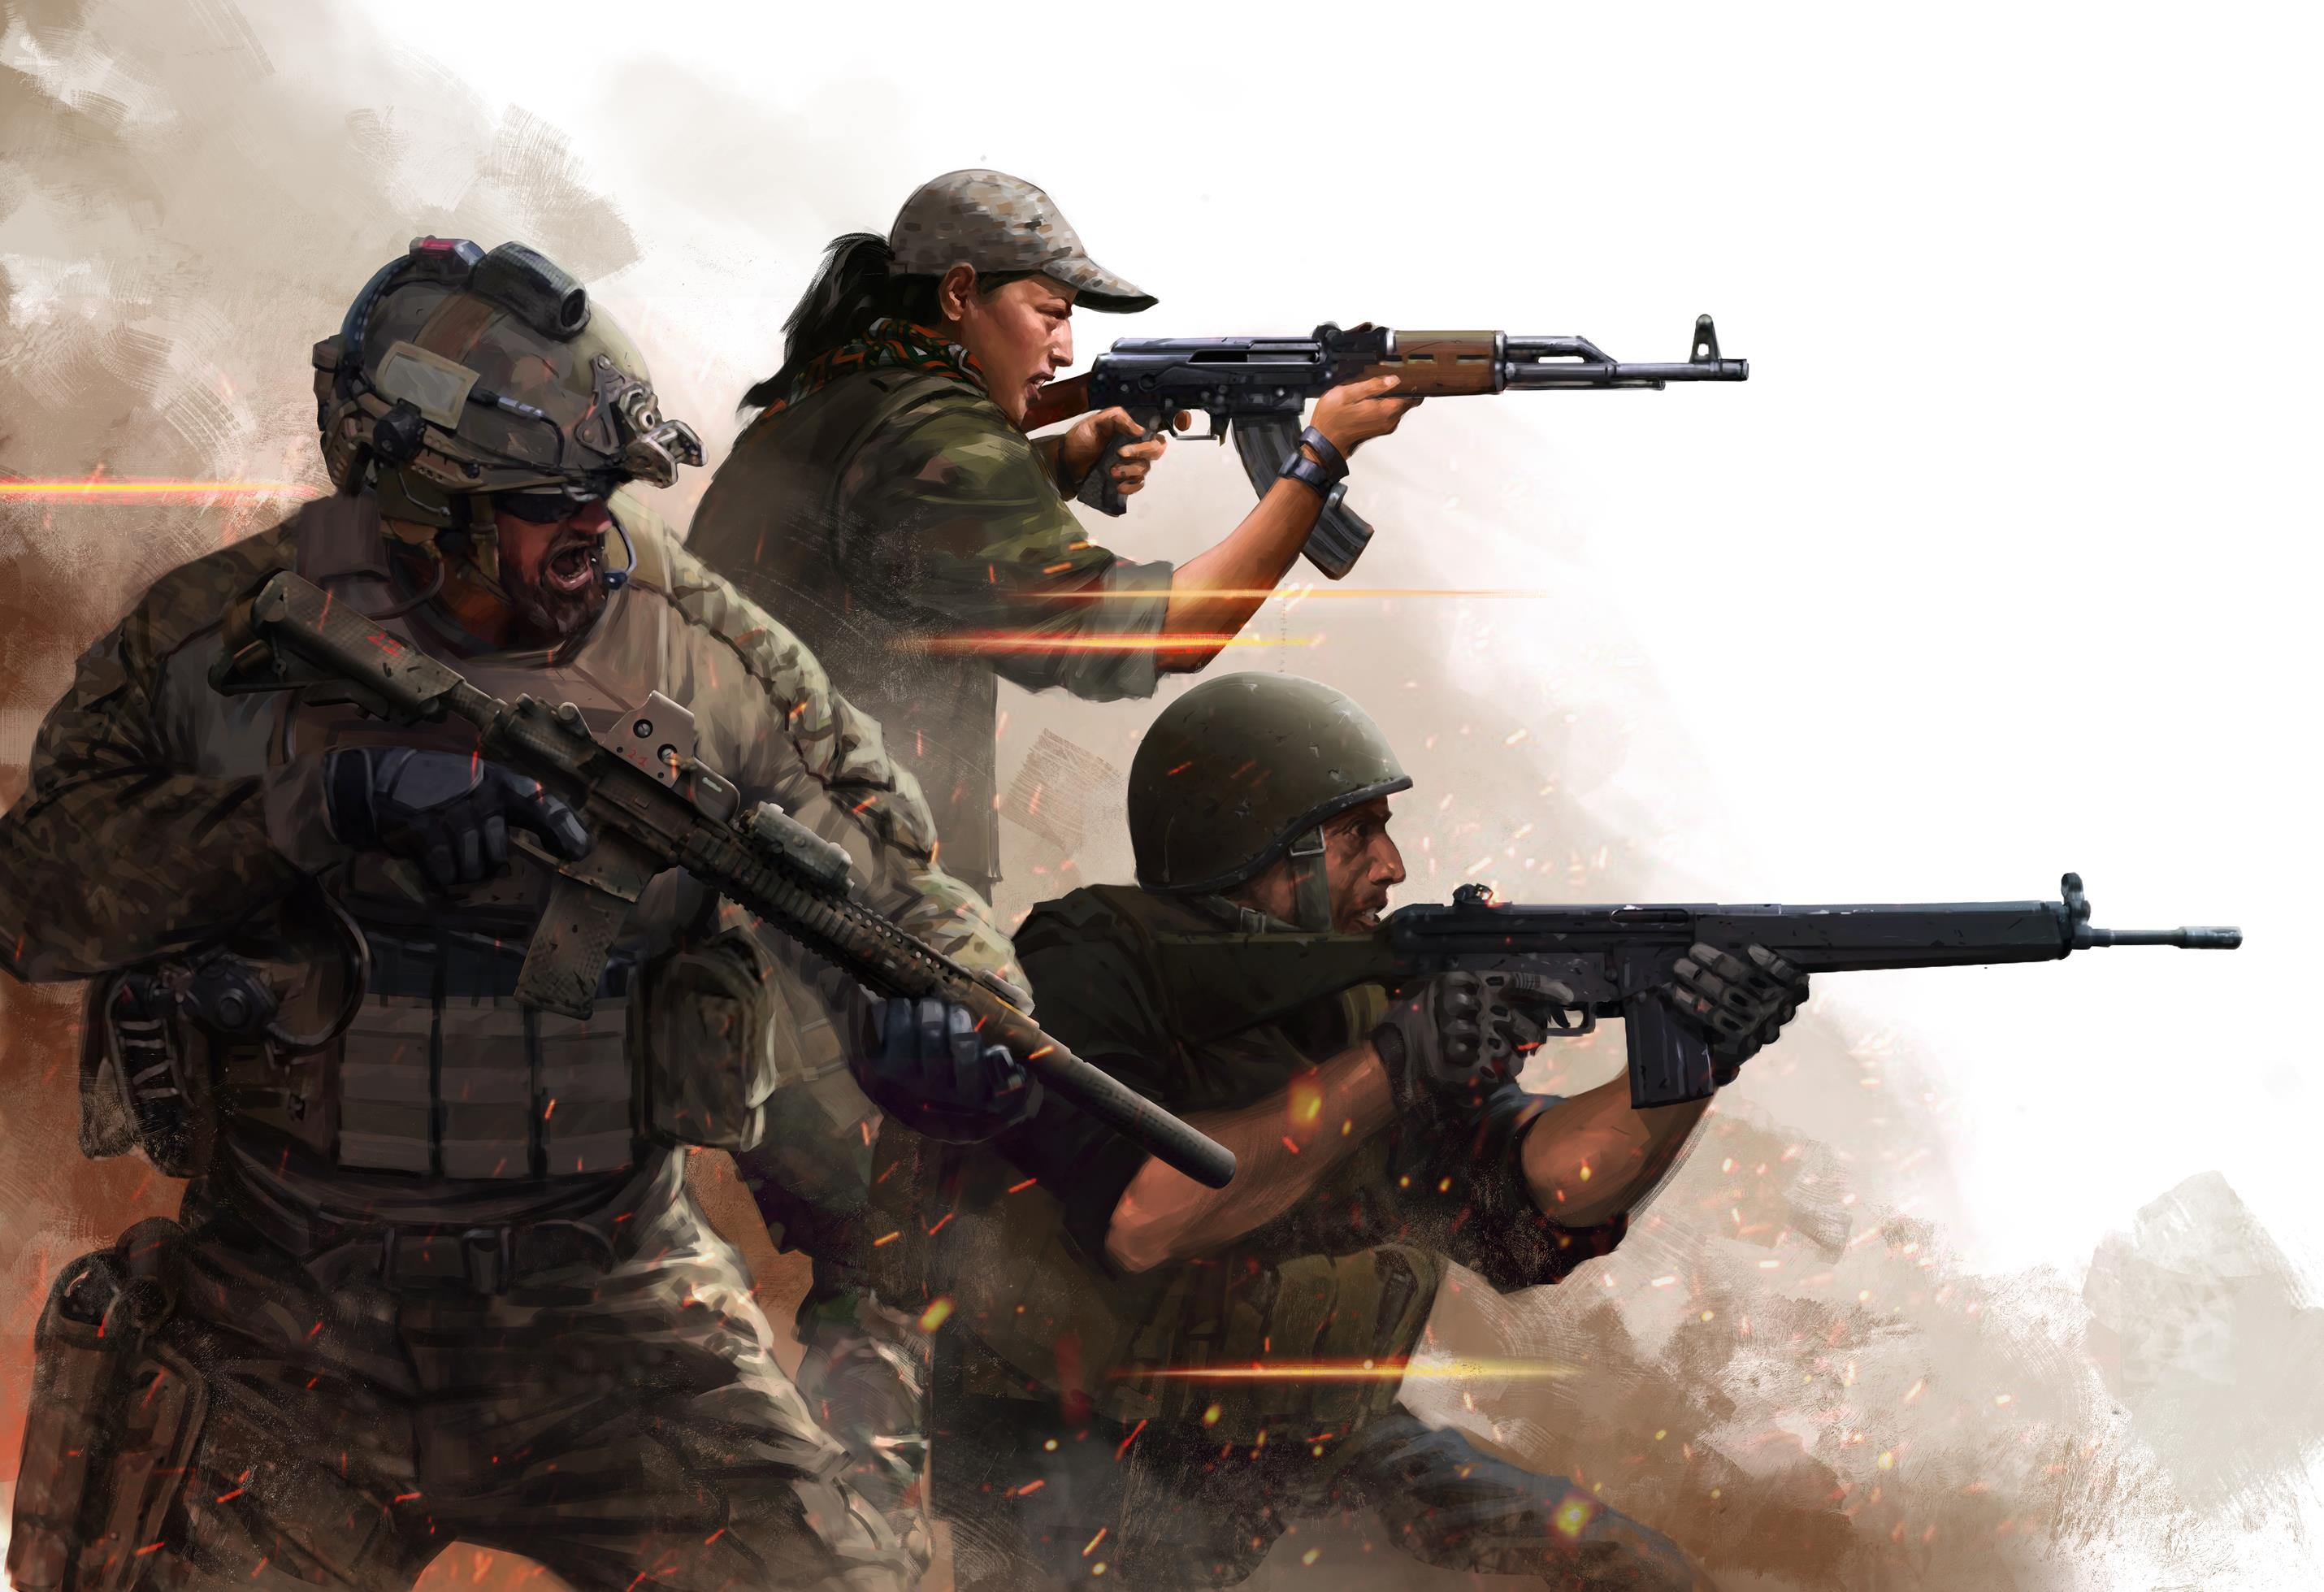 Insurgency: Sandstorm mixes tense co-op with ARMA-lite gameplay - VG247